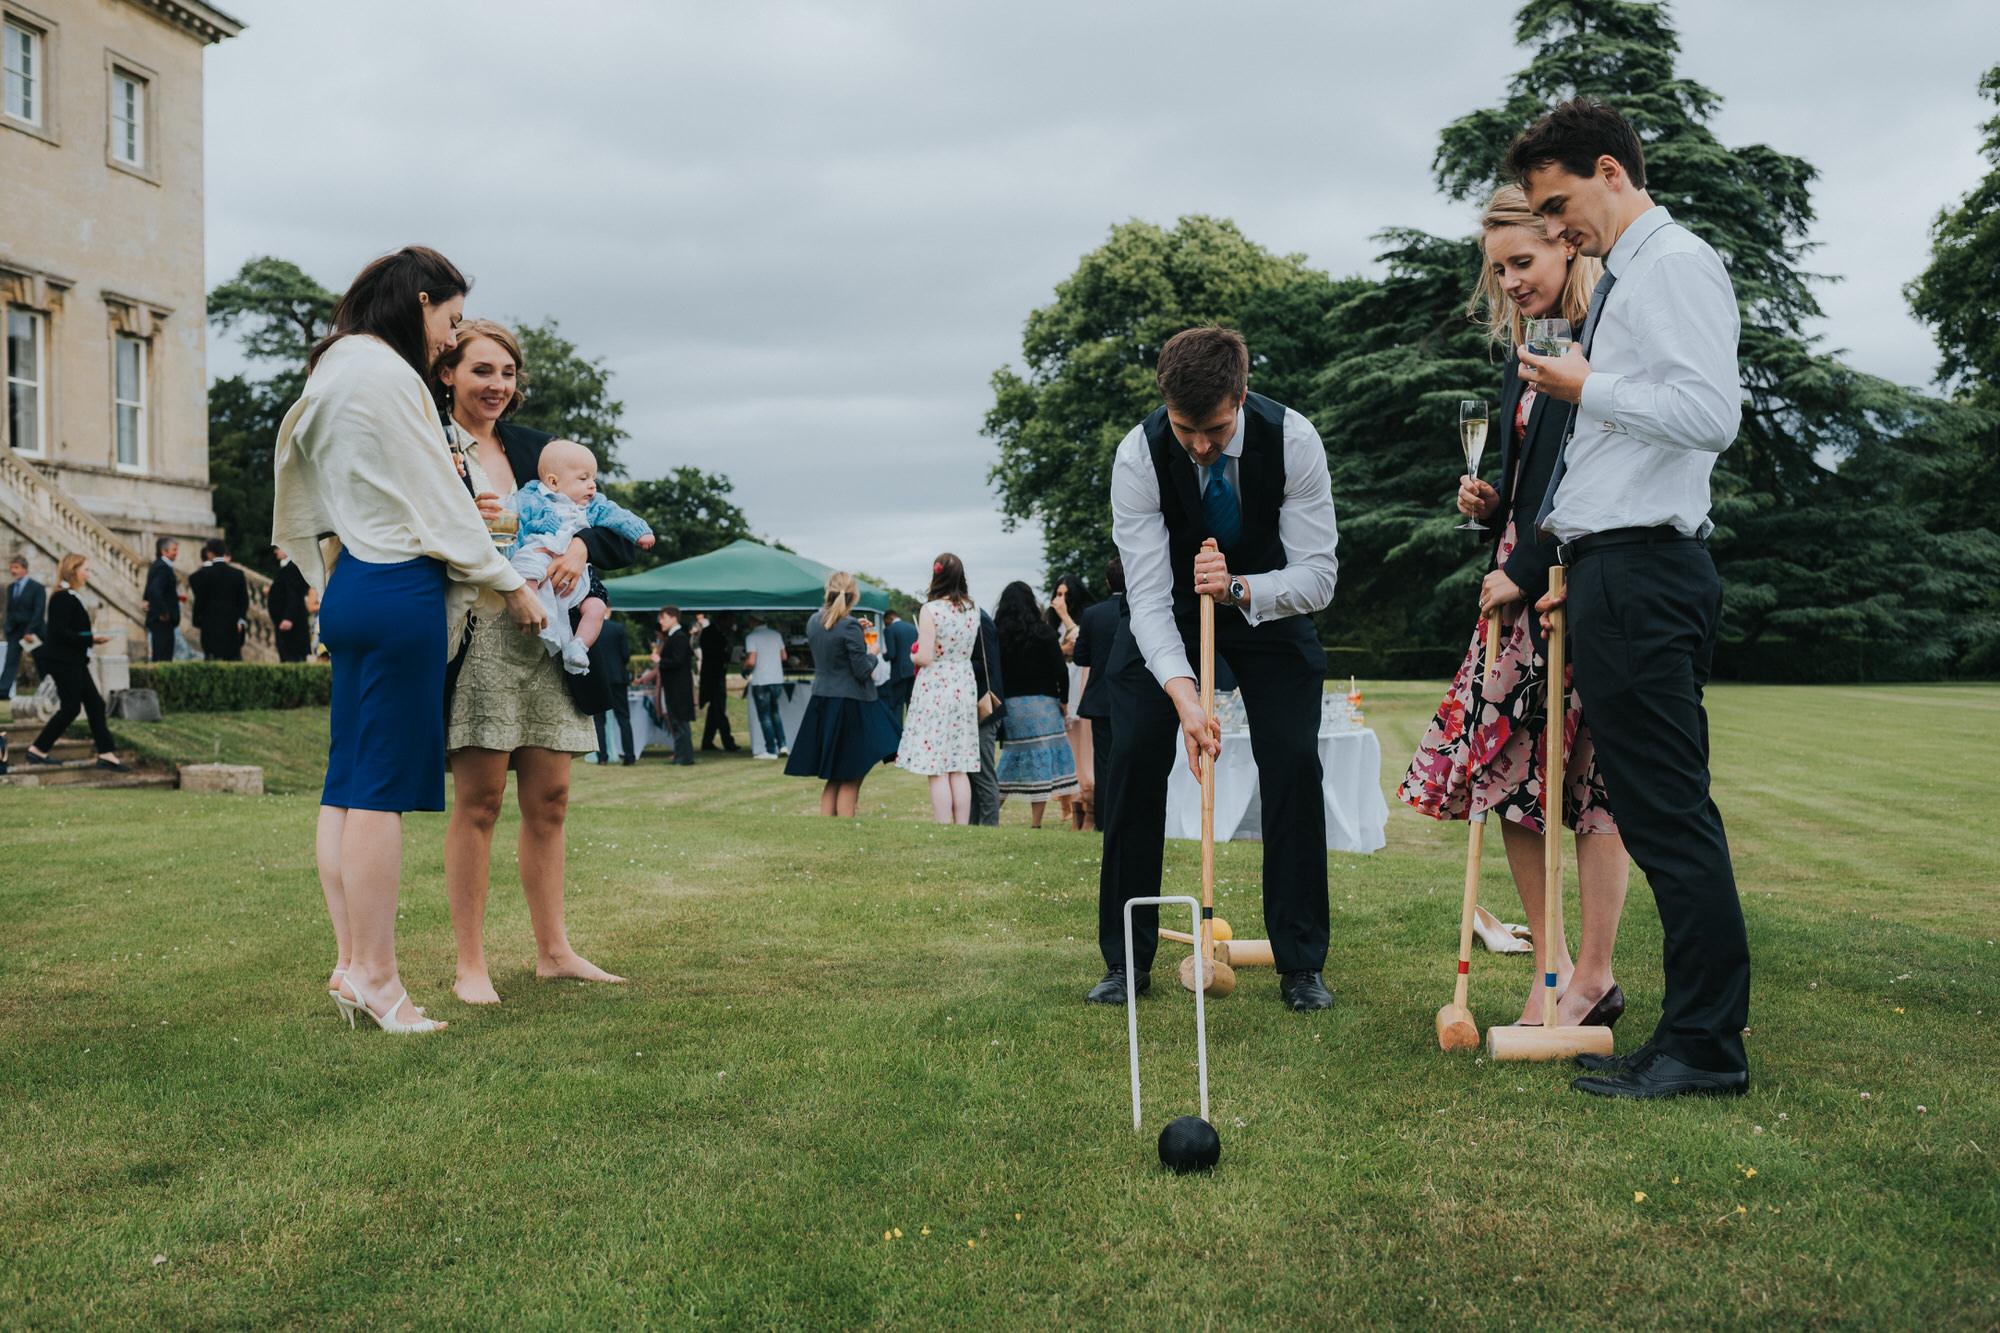 Wedding reception at Kirtlington park